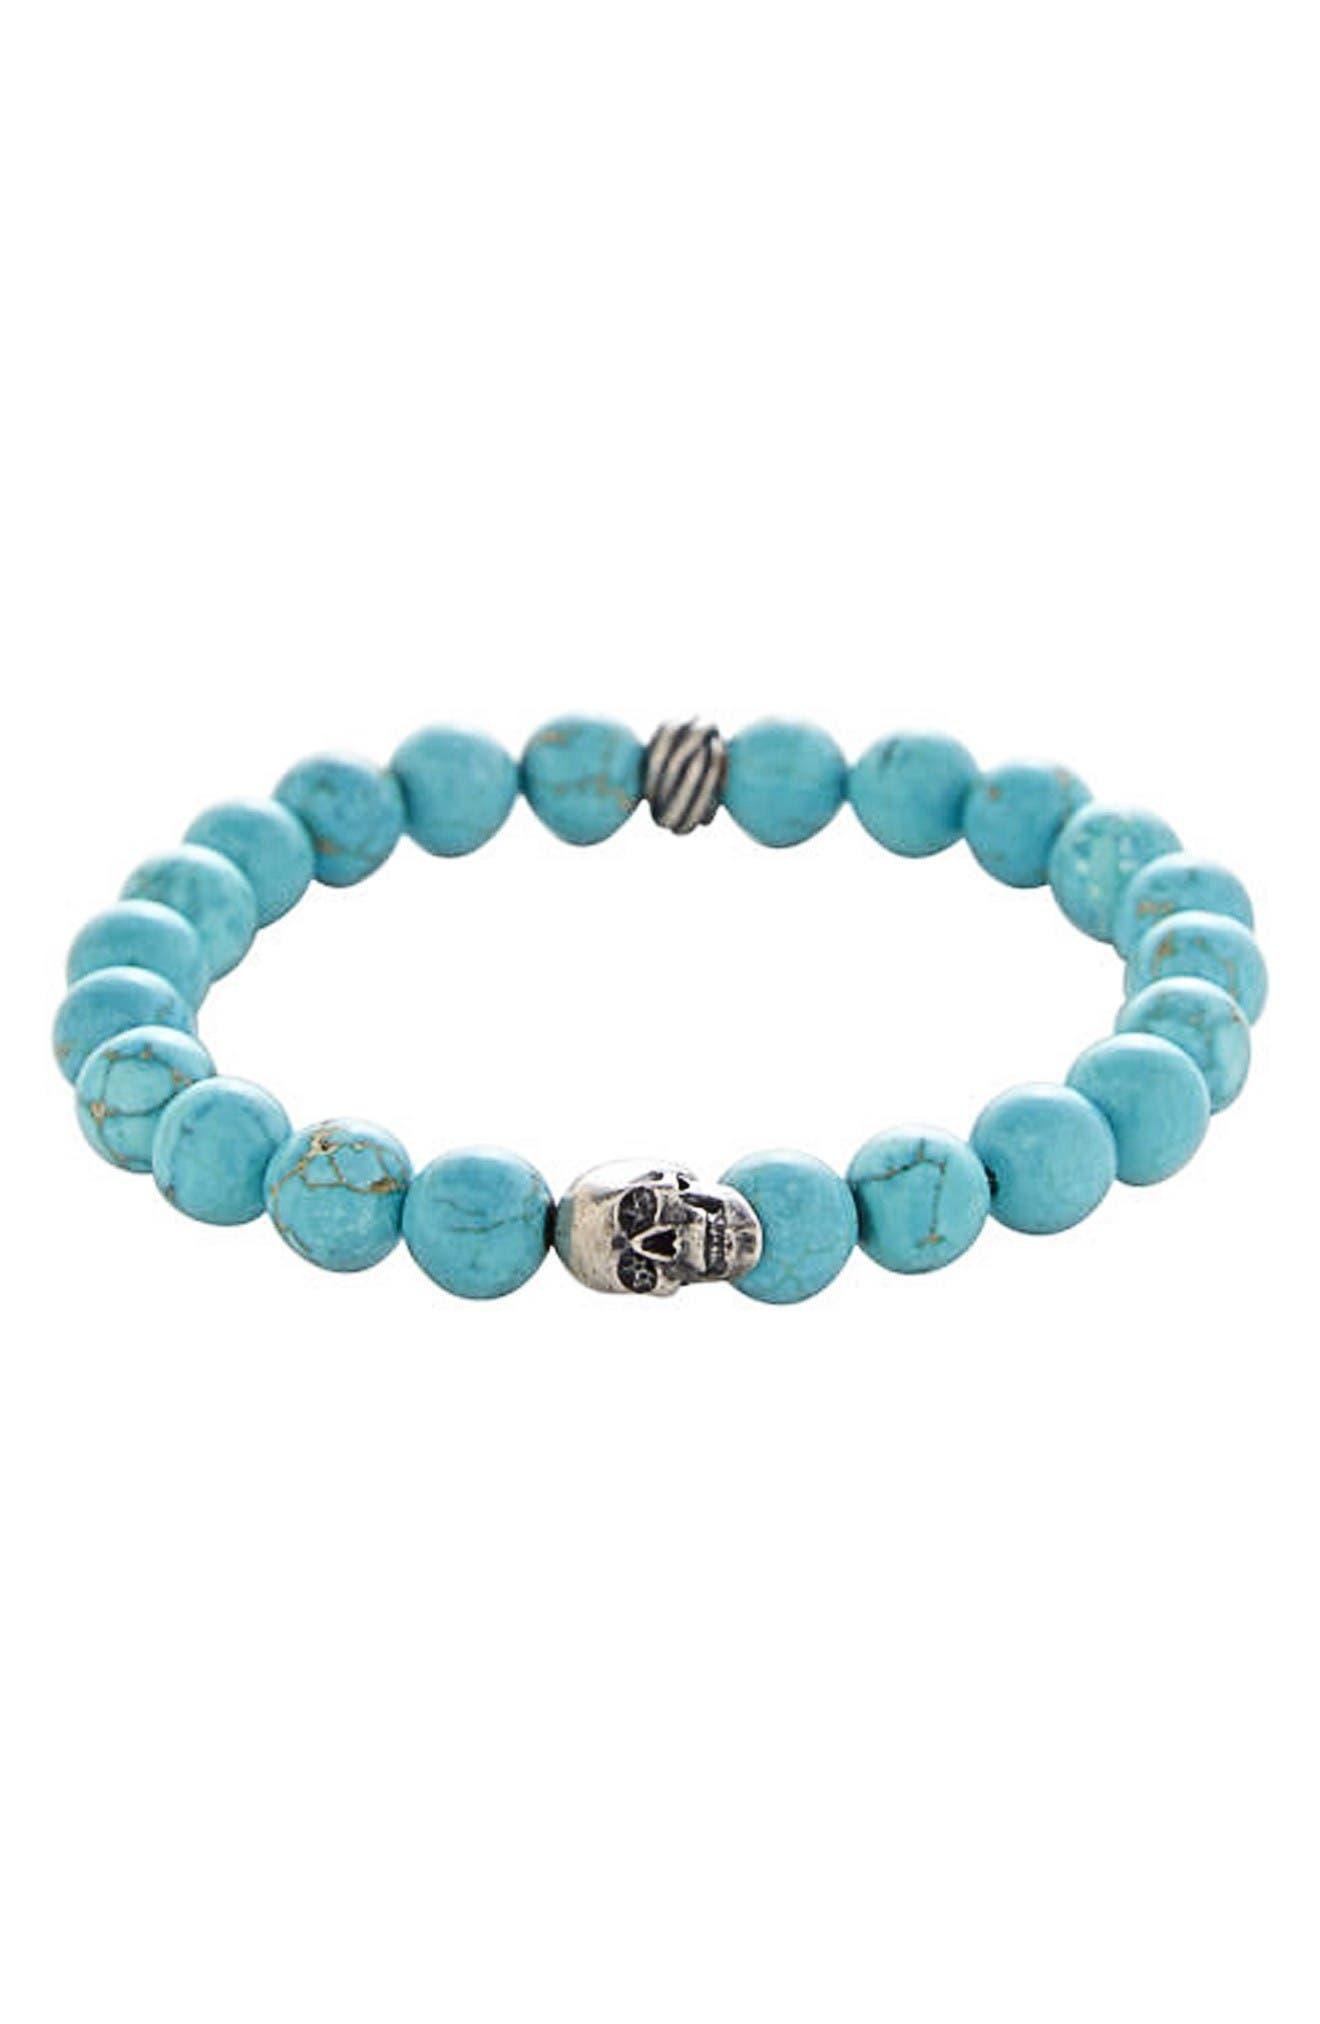 Main Image - Degs & Sal Stone Bead Stretch Bracelet